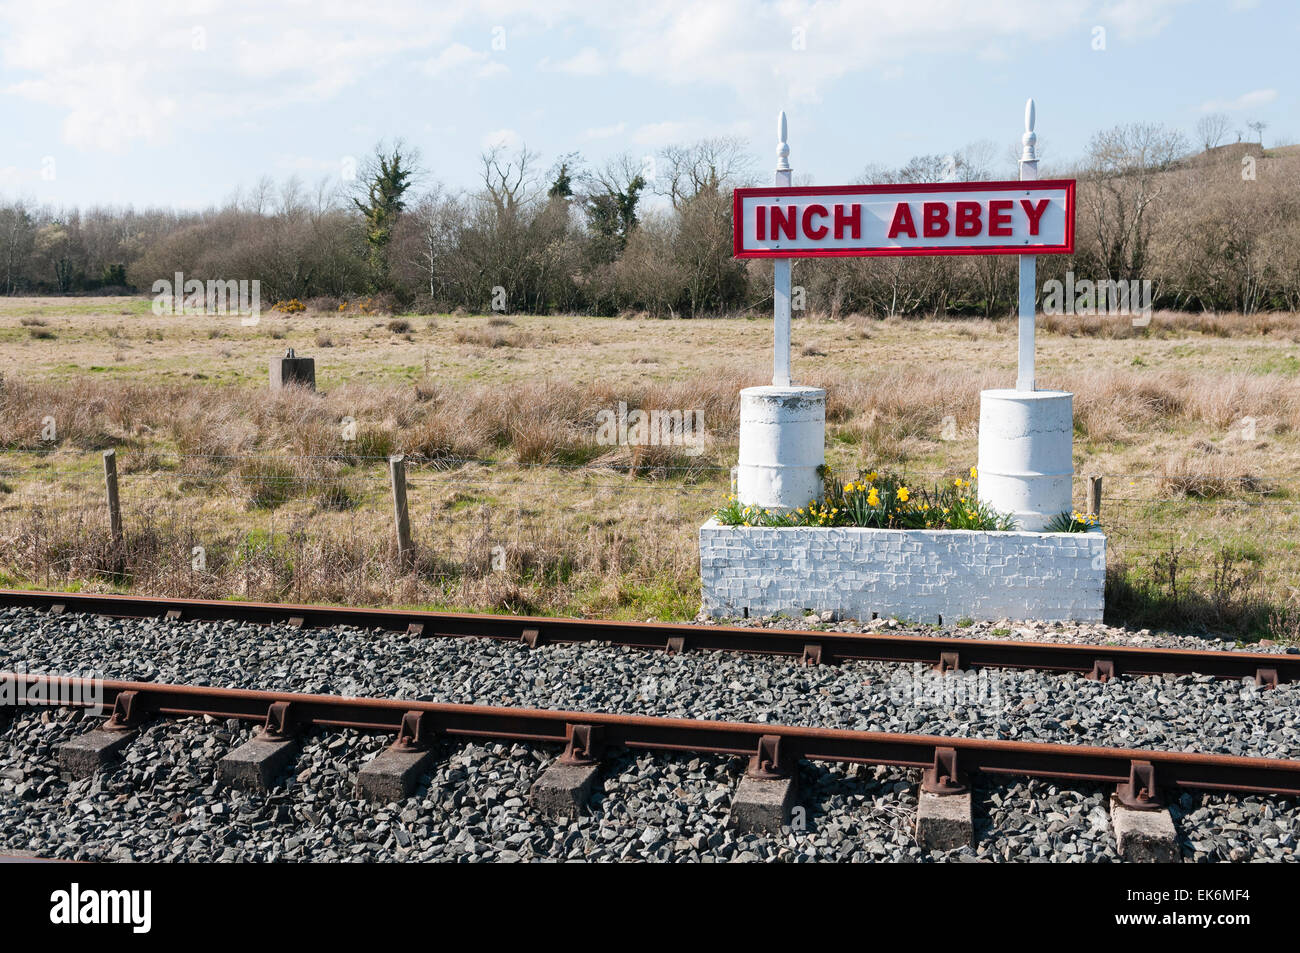 Inch Abbey railway platform - Stock Image